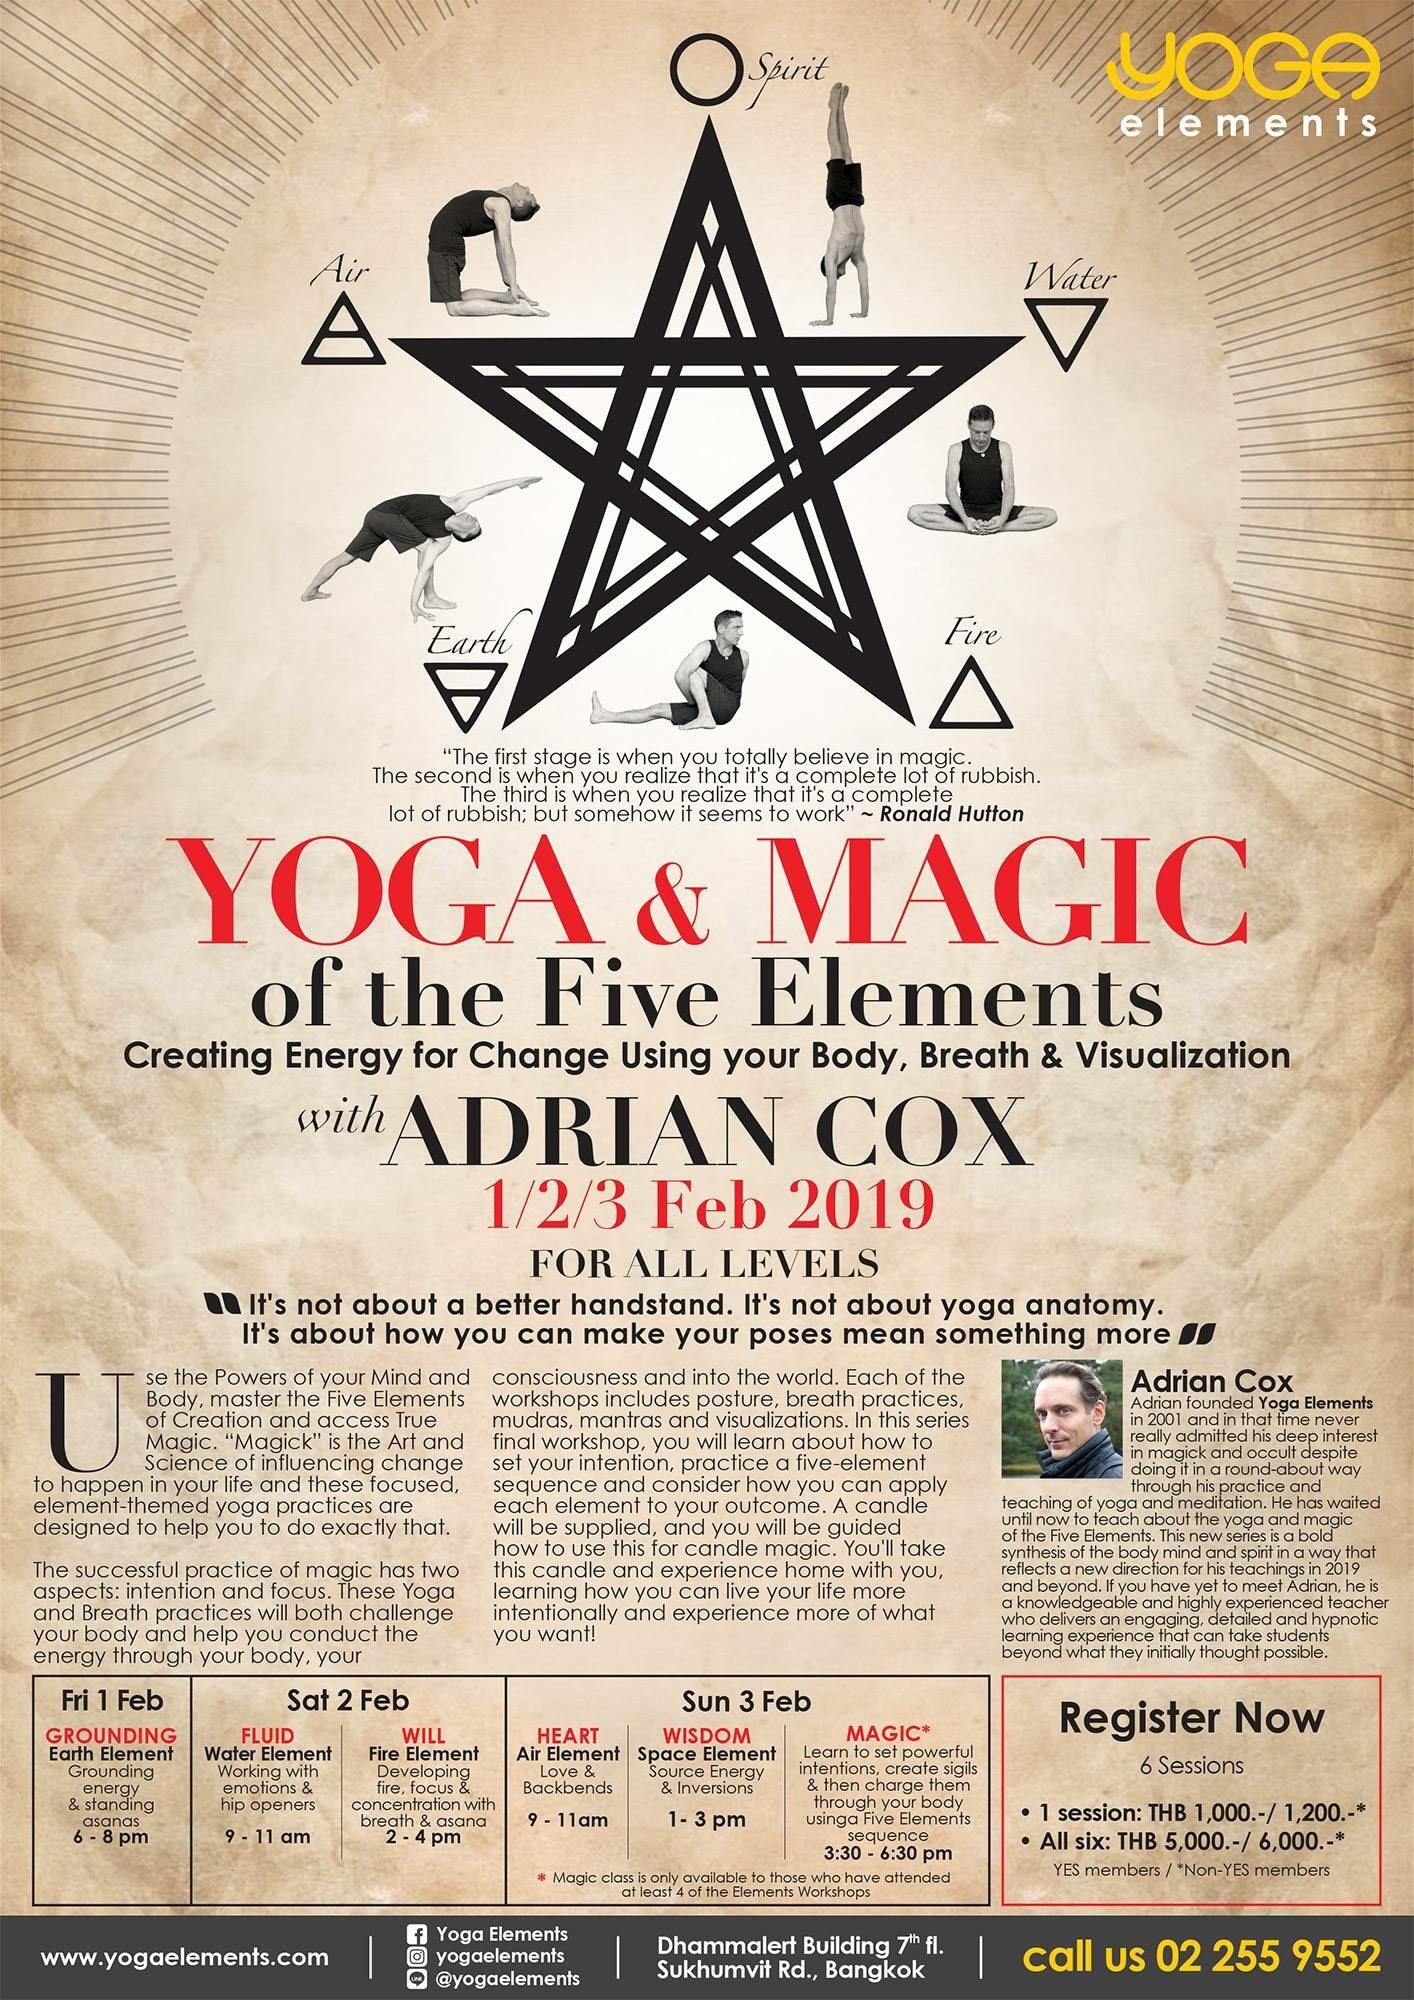 Adrian Cox Workshops_181228_0001.jpg